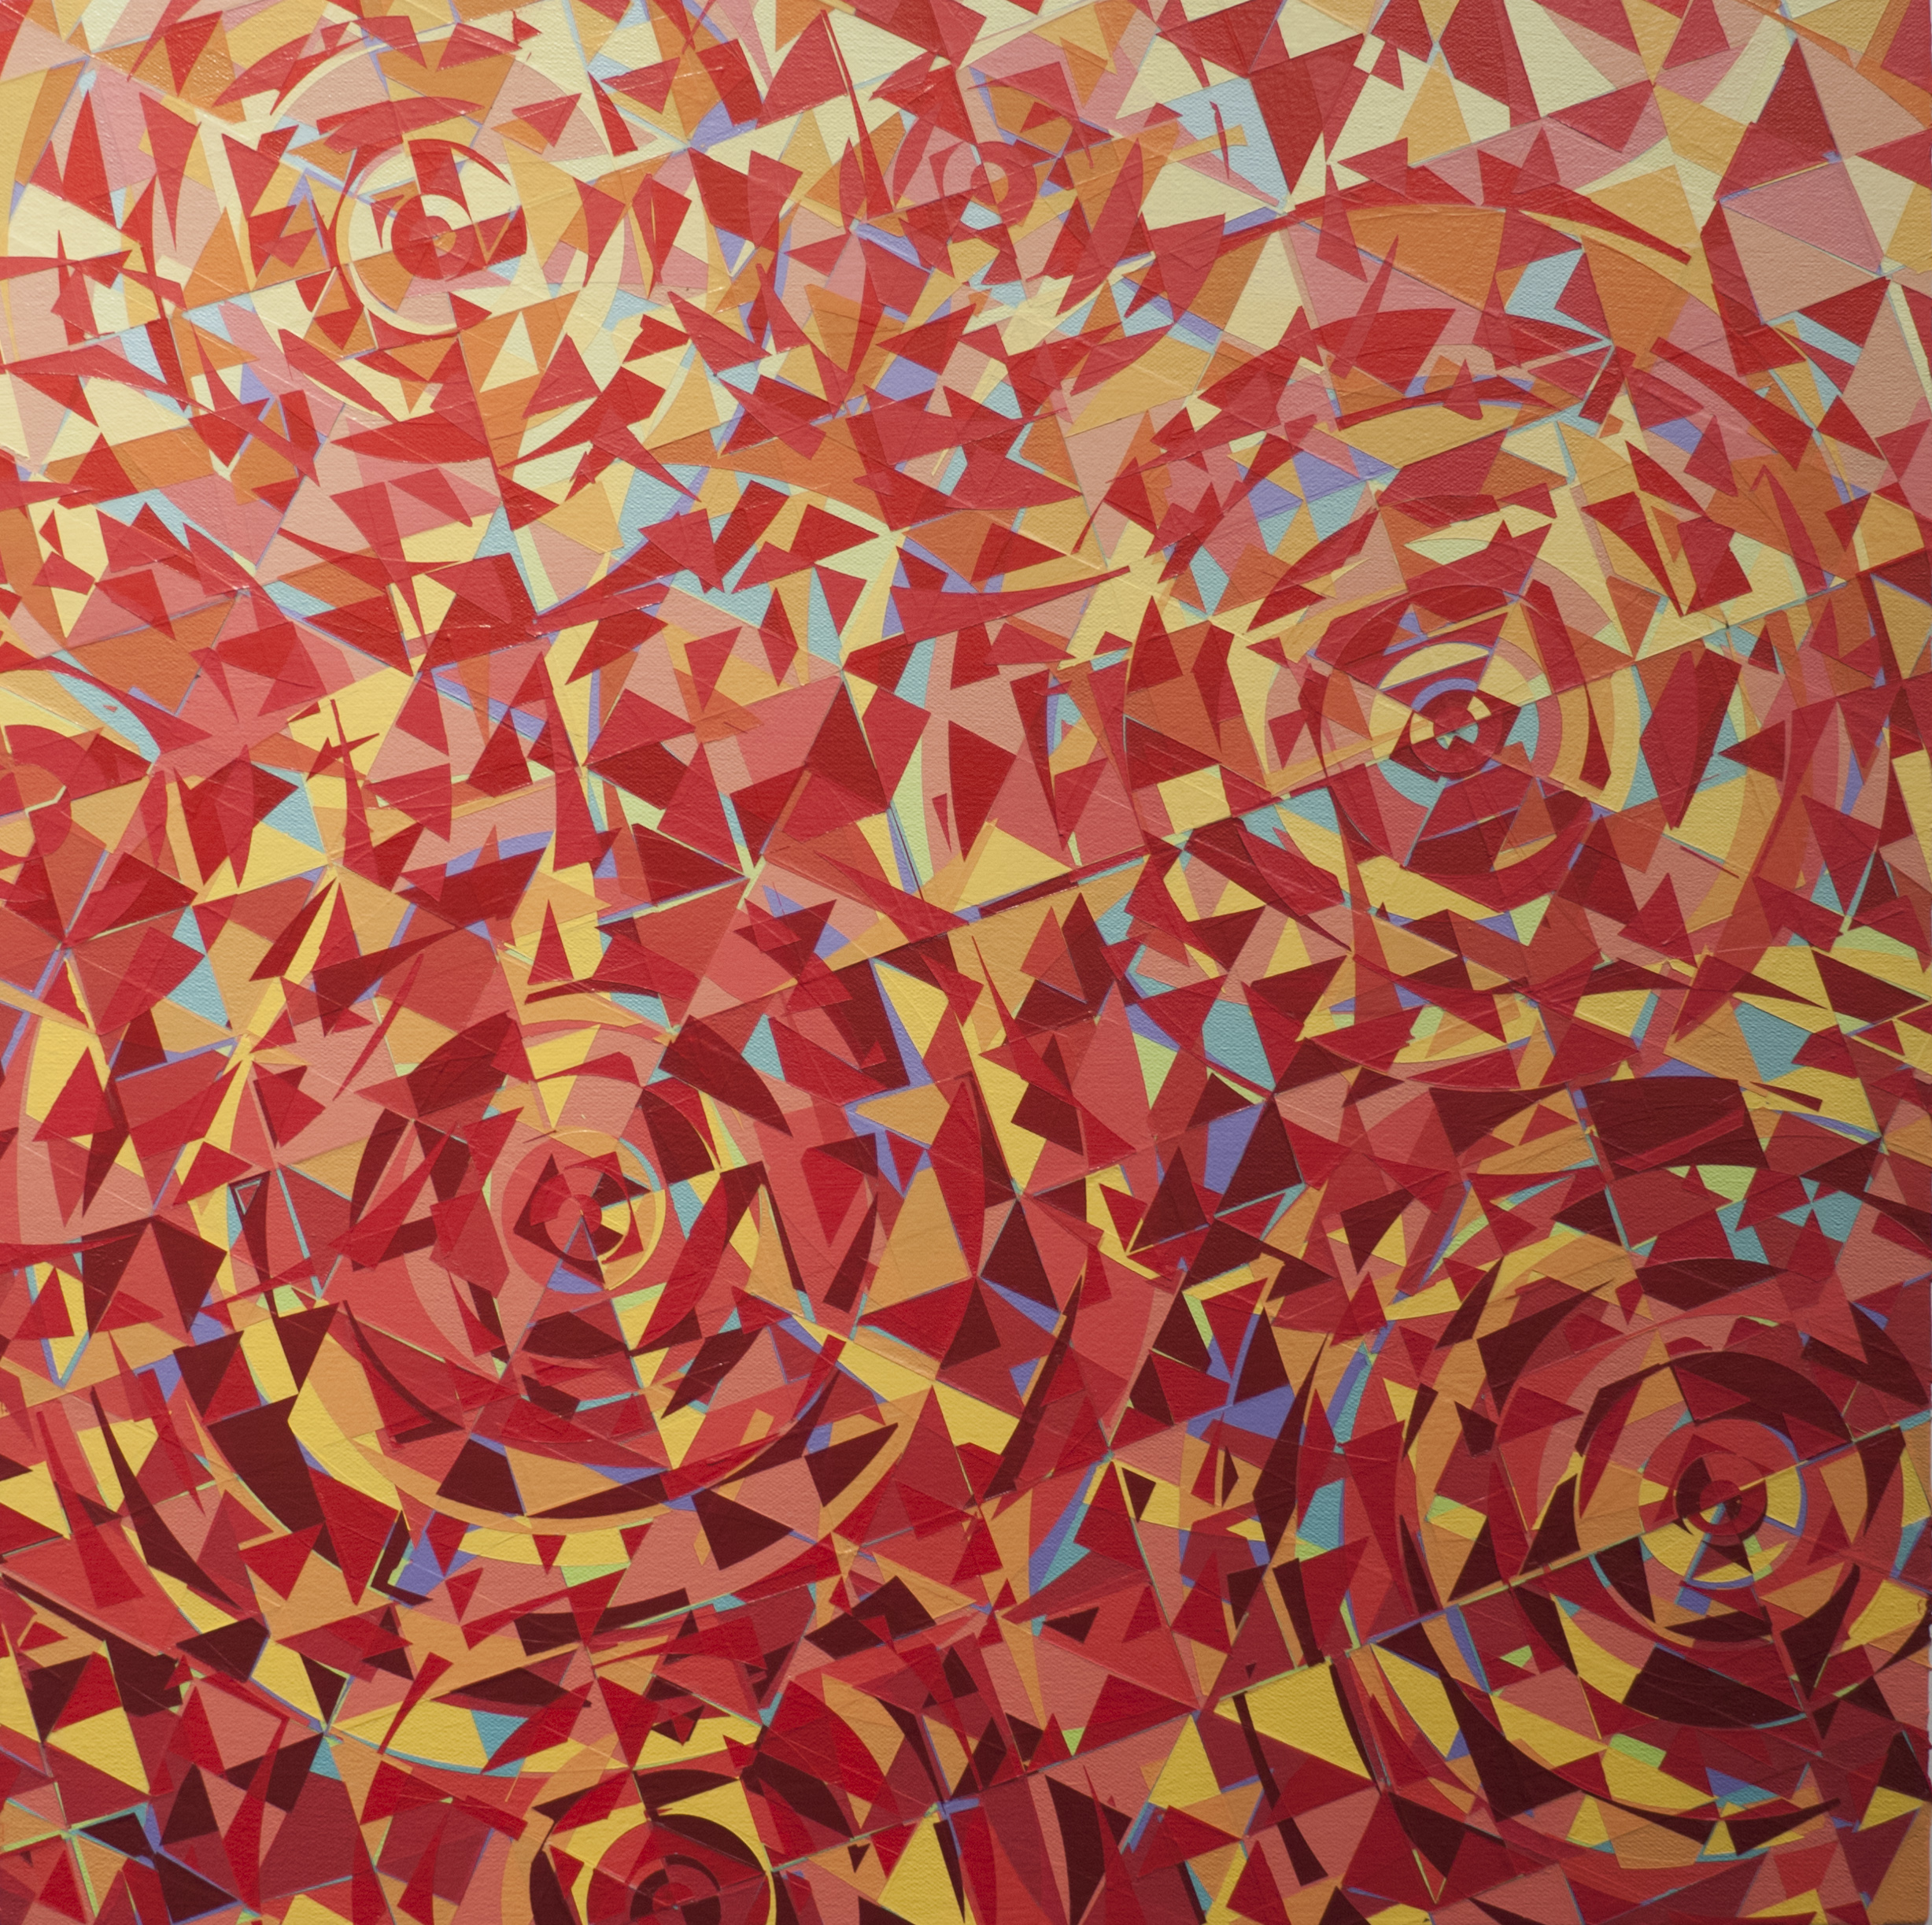 214 Harmonizer (2019) Acrylic on Canvas 20%22x20%22 cropped.jpg